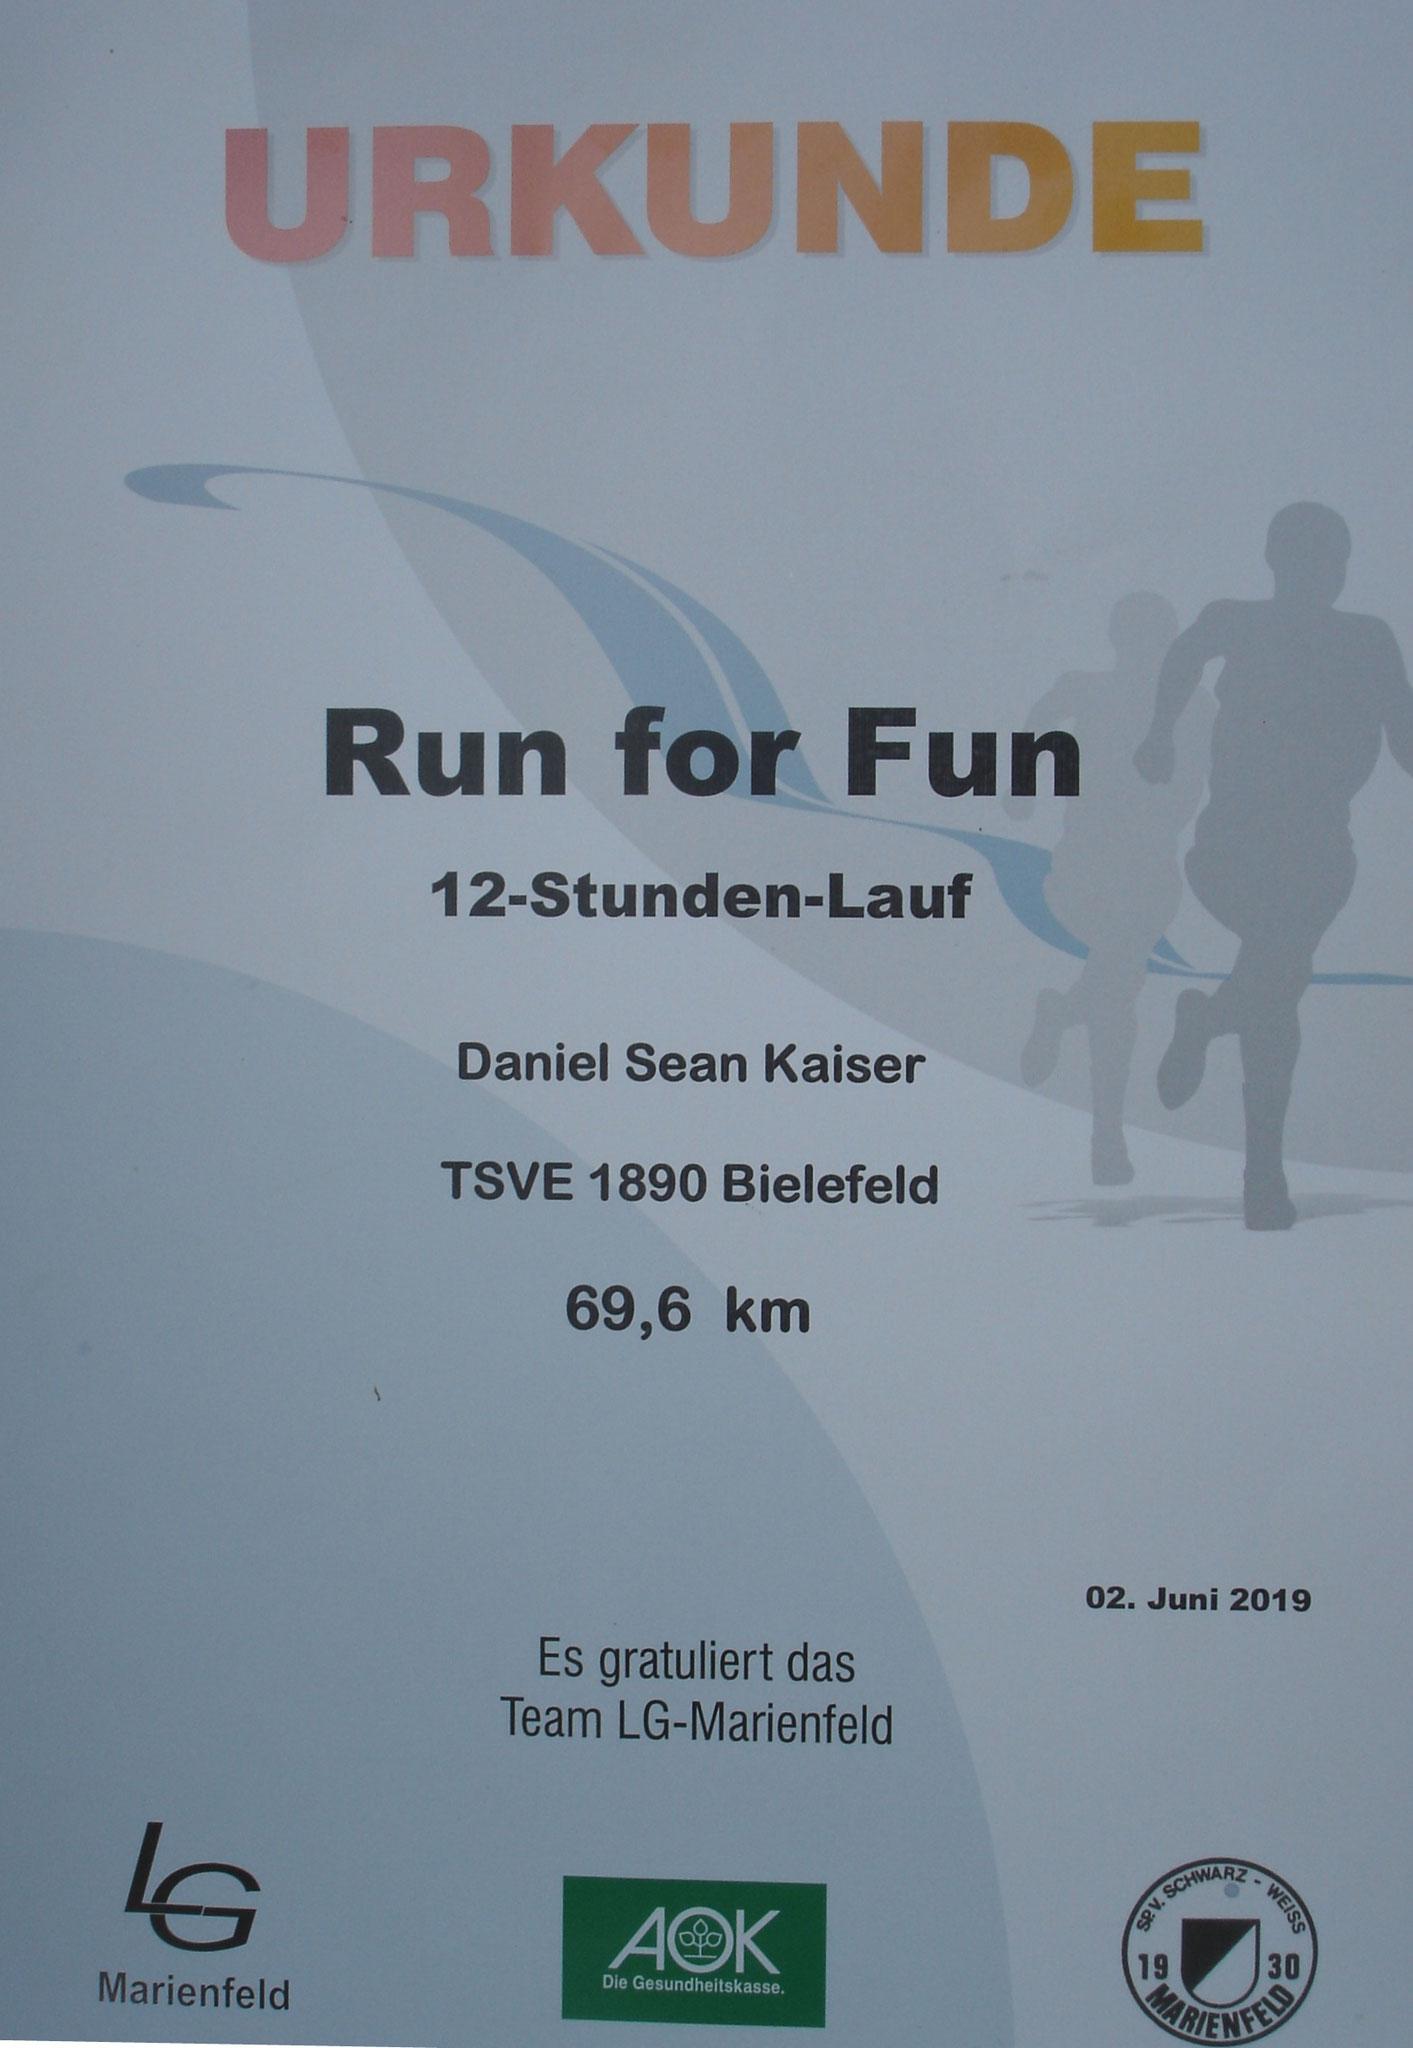 Run for Fun 2019 - Urkunde